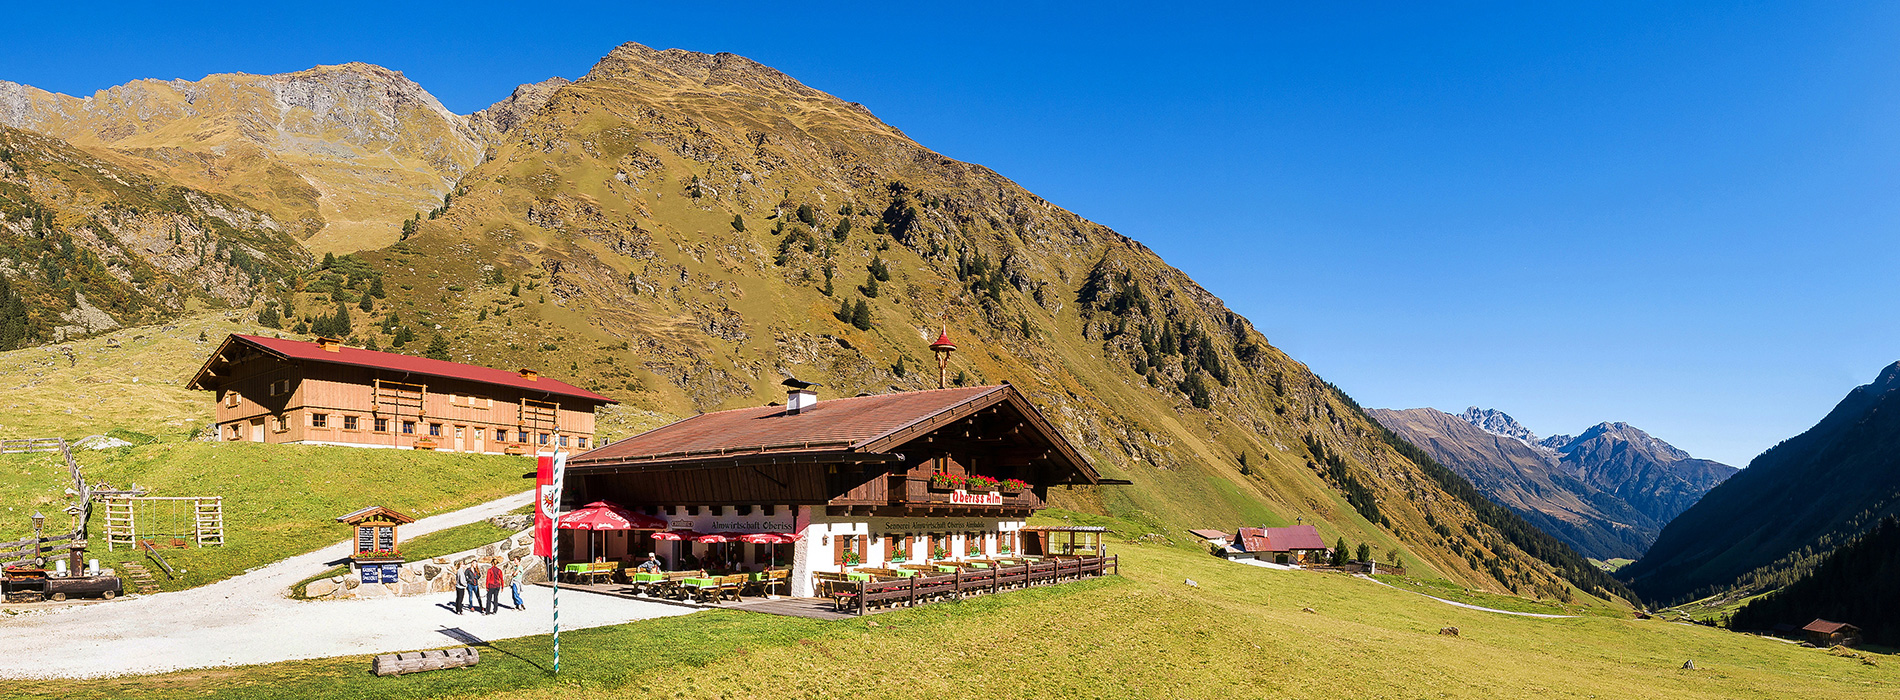 Oberiss-Alm-Ausflugsziel-im-Stubaital-Tirol